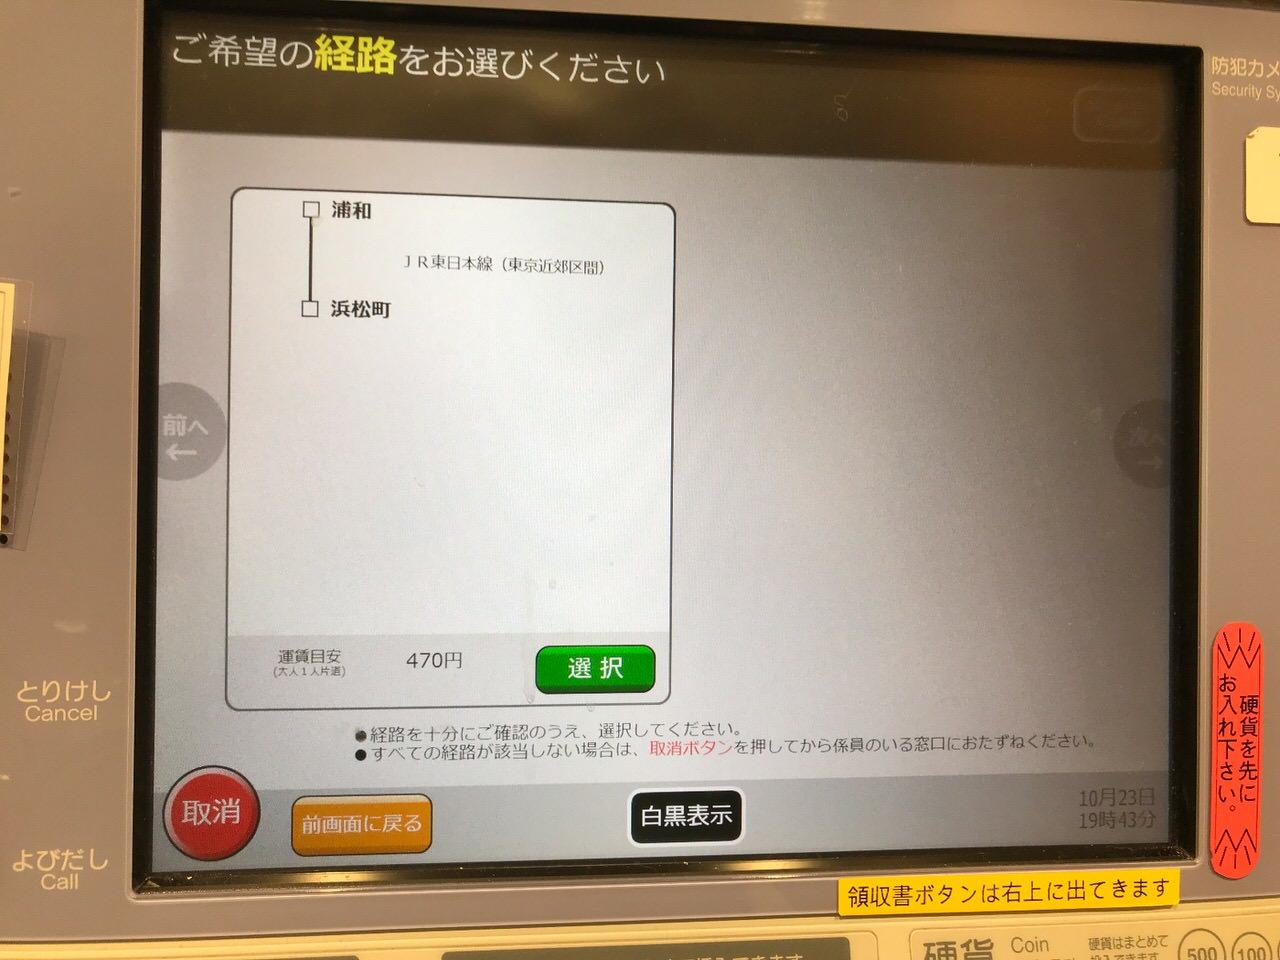 Jr creditcard ticket 9403